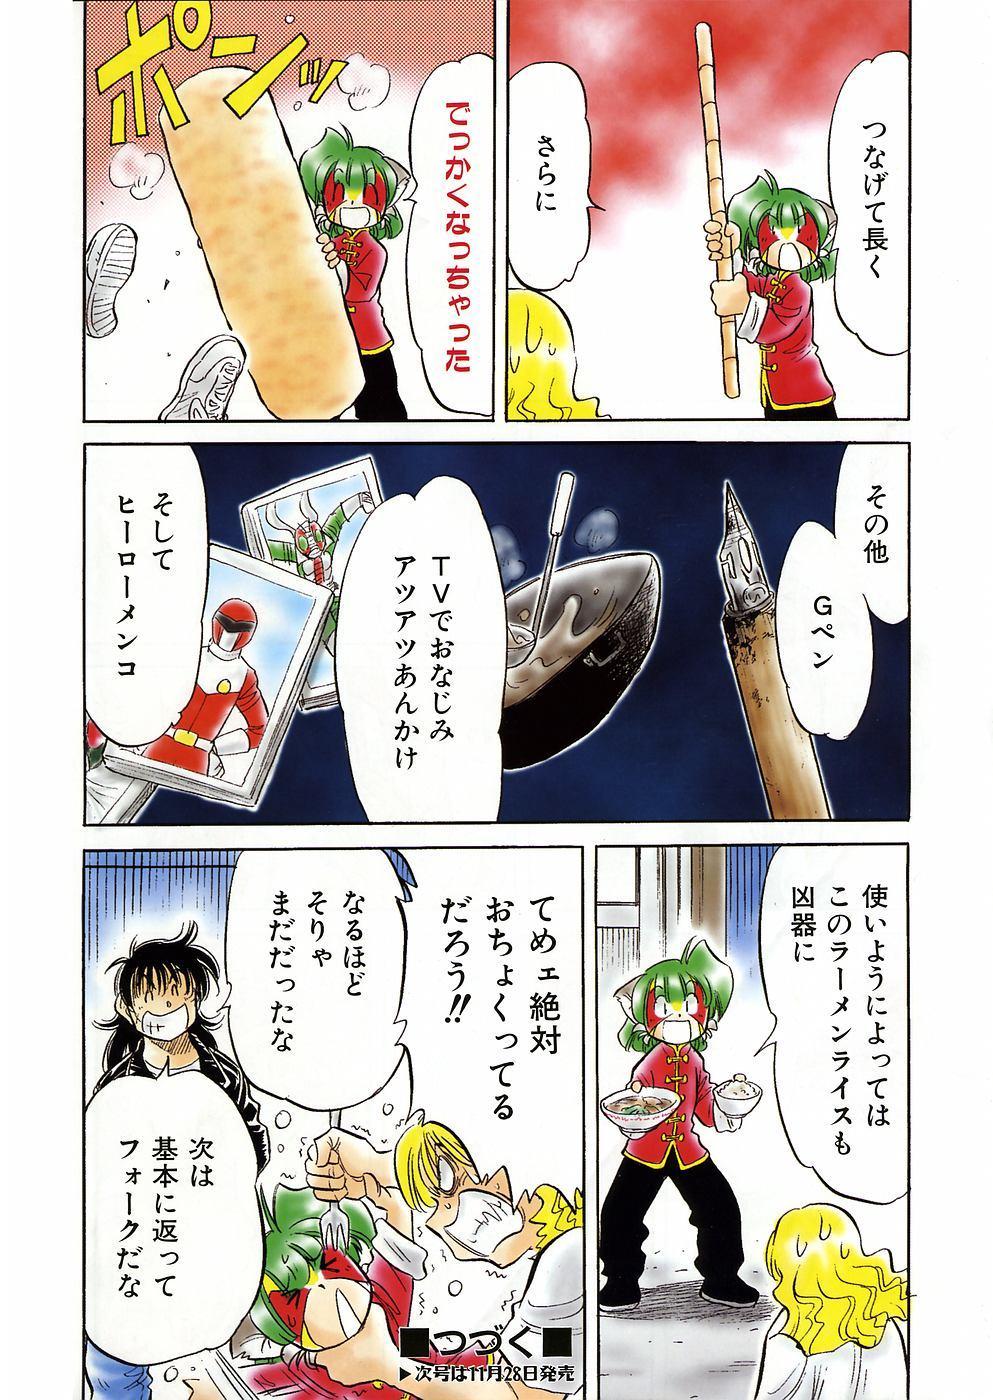 COMIC AUN 2005-12 Vol. 115 410